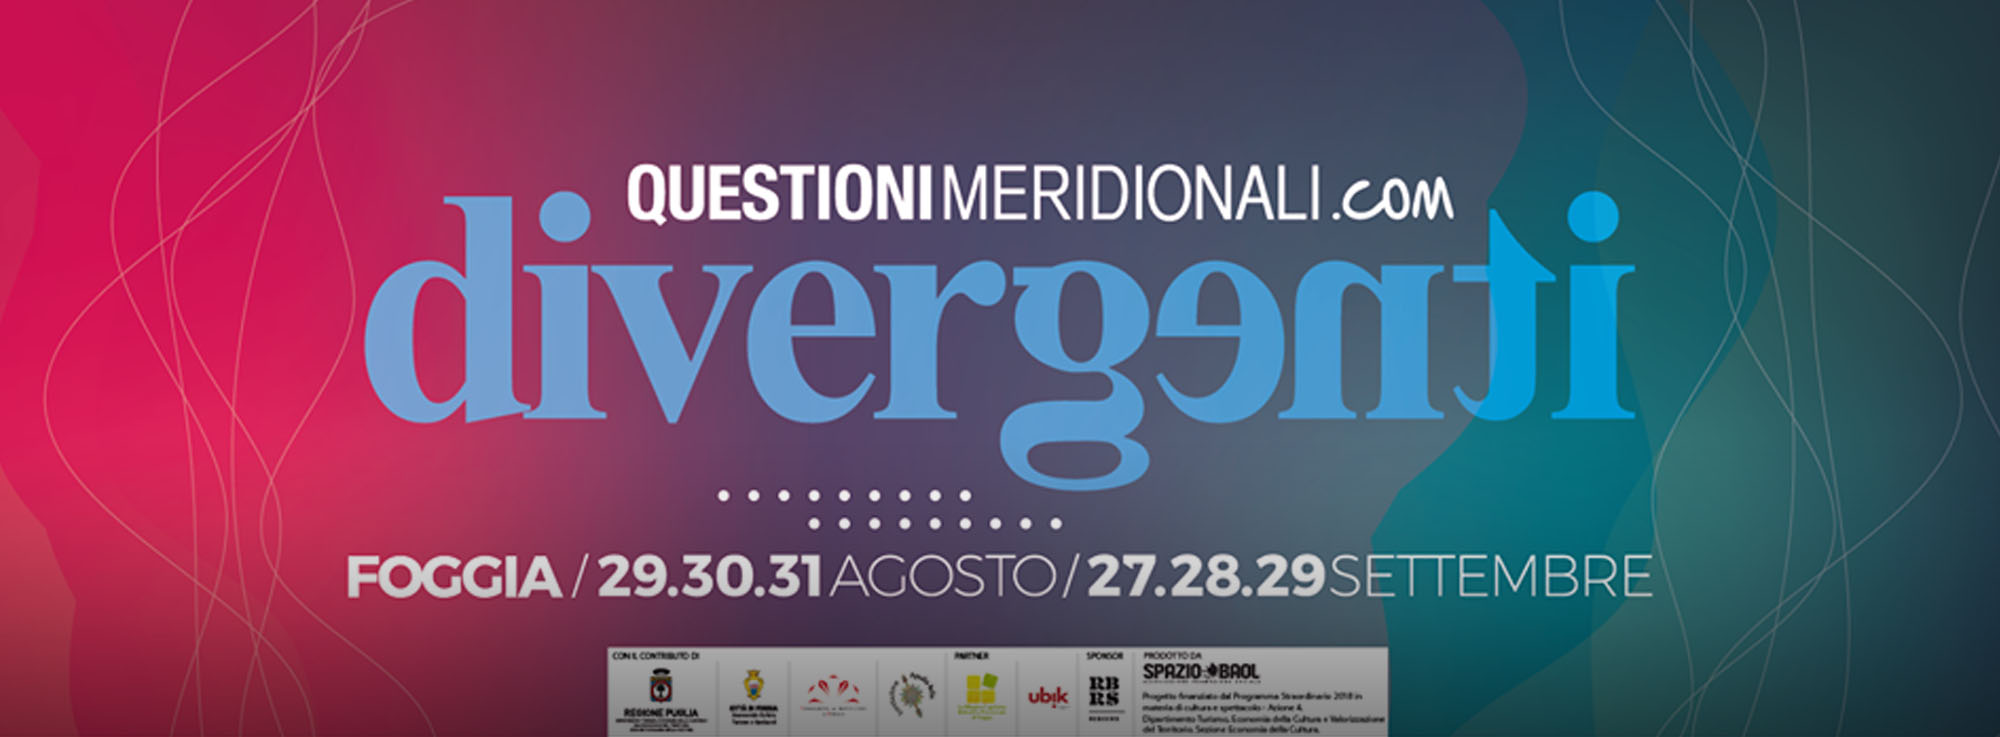 Foggia: Questioni meridionali